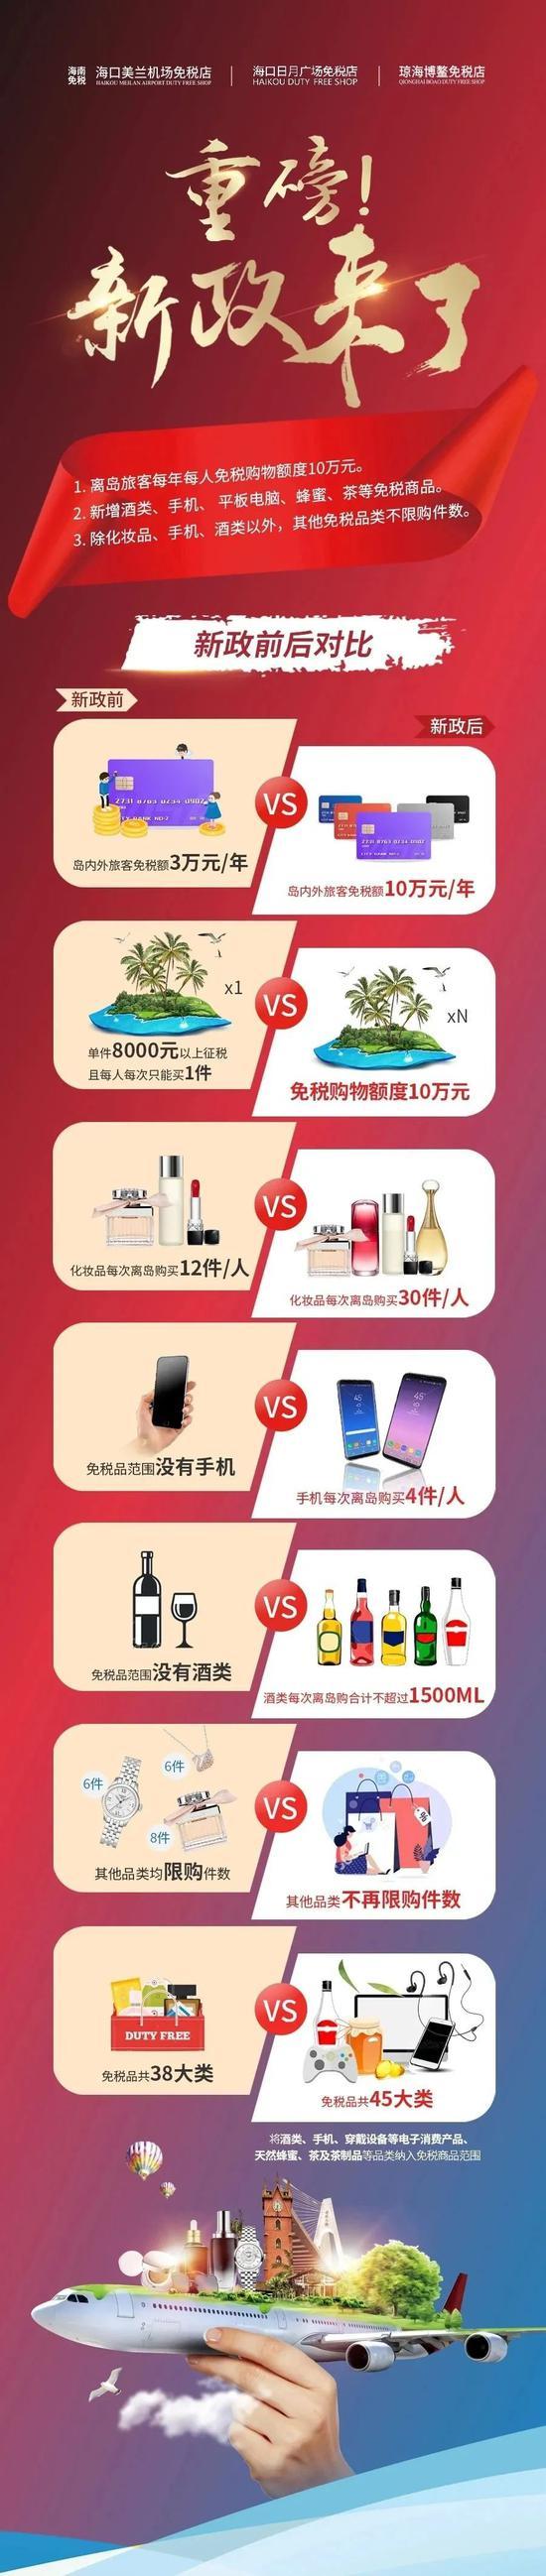 http://www.liuyubo.com/zhengwu/2796878.html